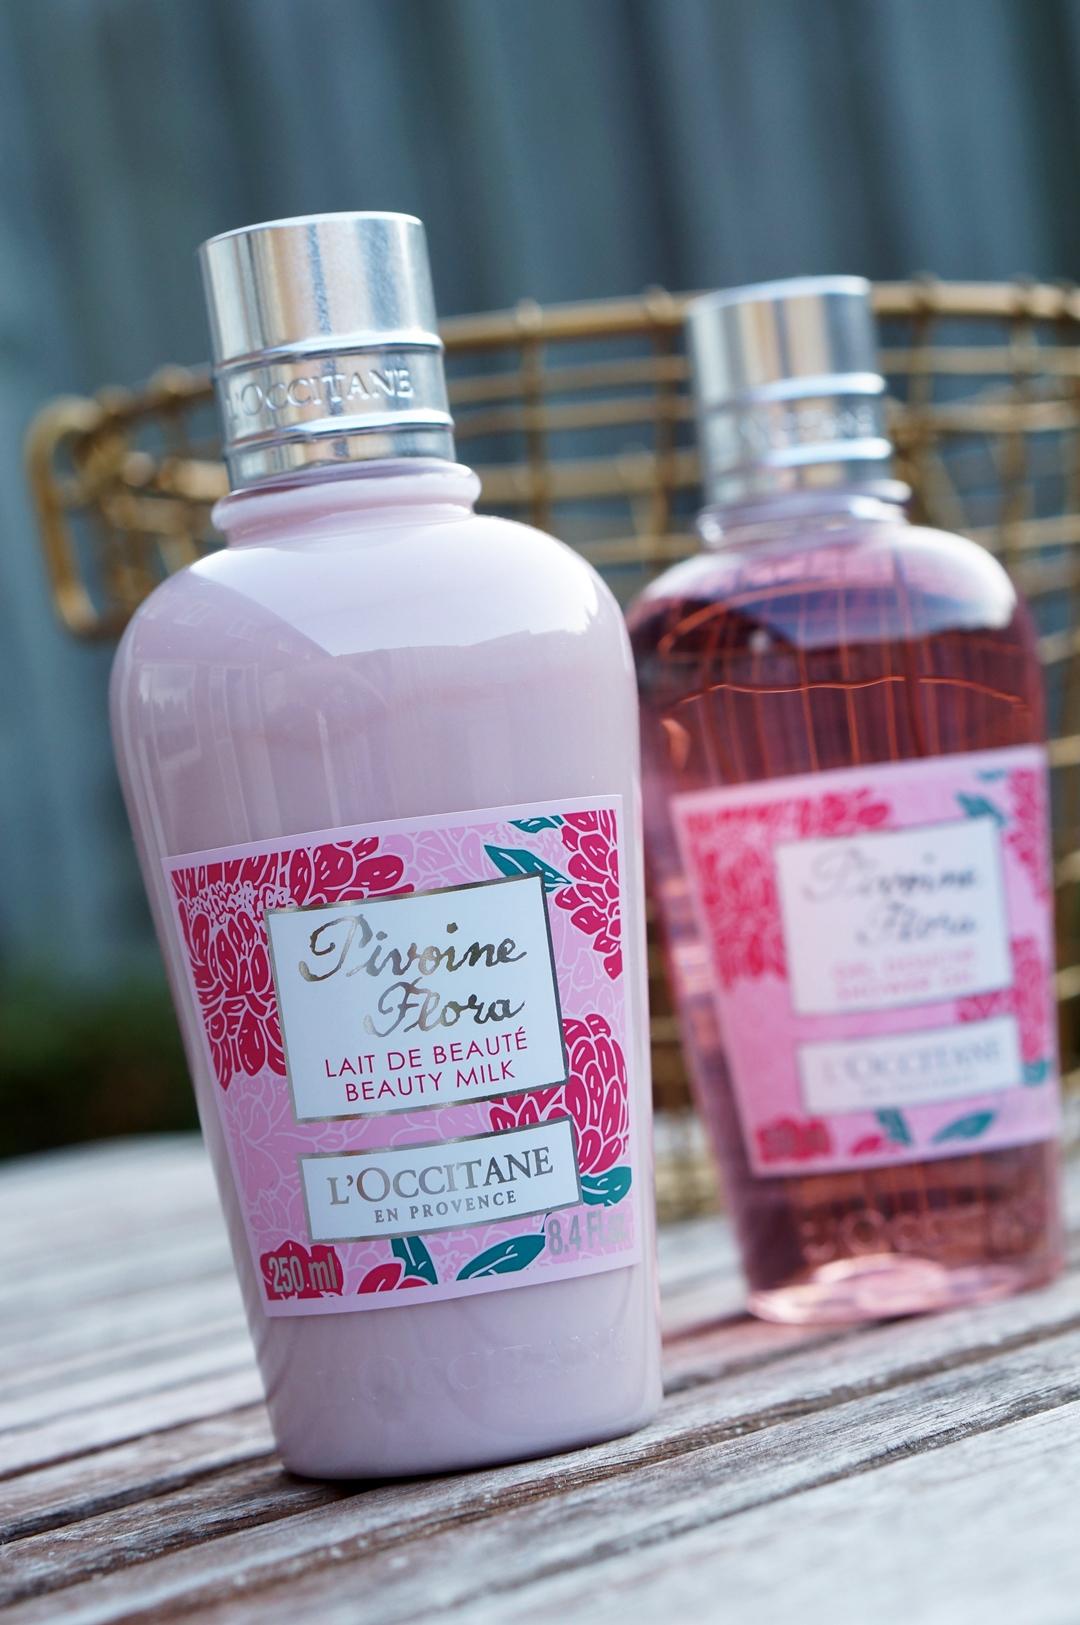 L'occitane-pivoine-floraeau-de-toilette-shower-gel-body-lotion-lippenbalsem (5)